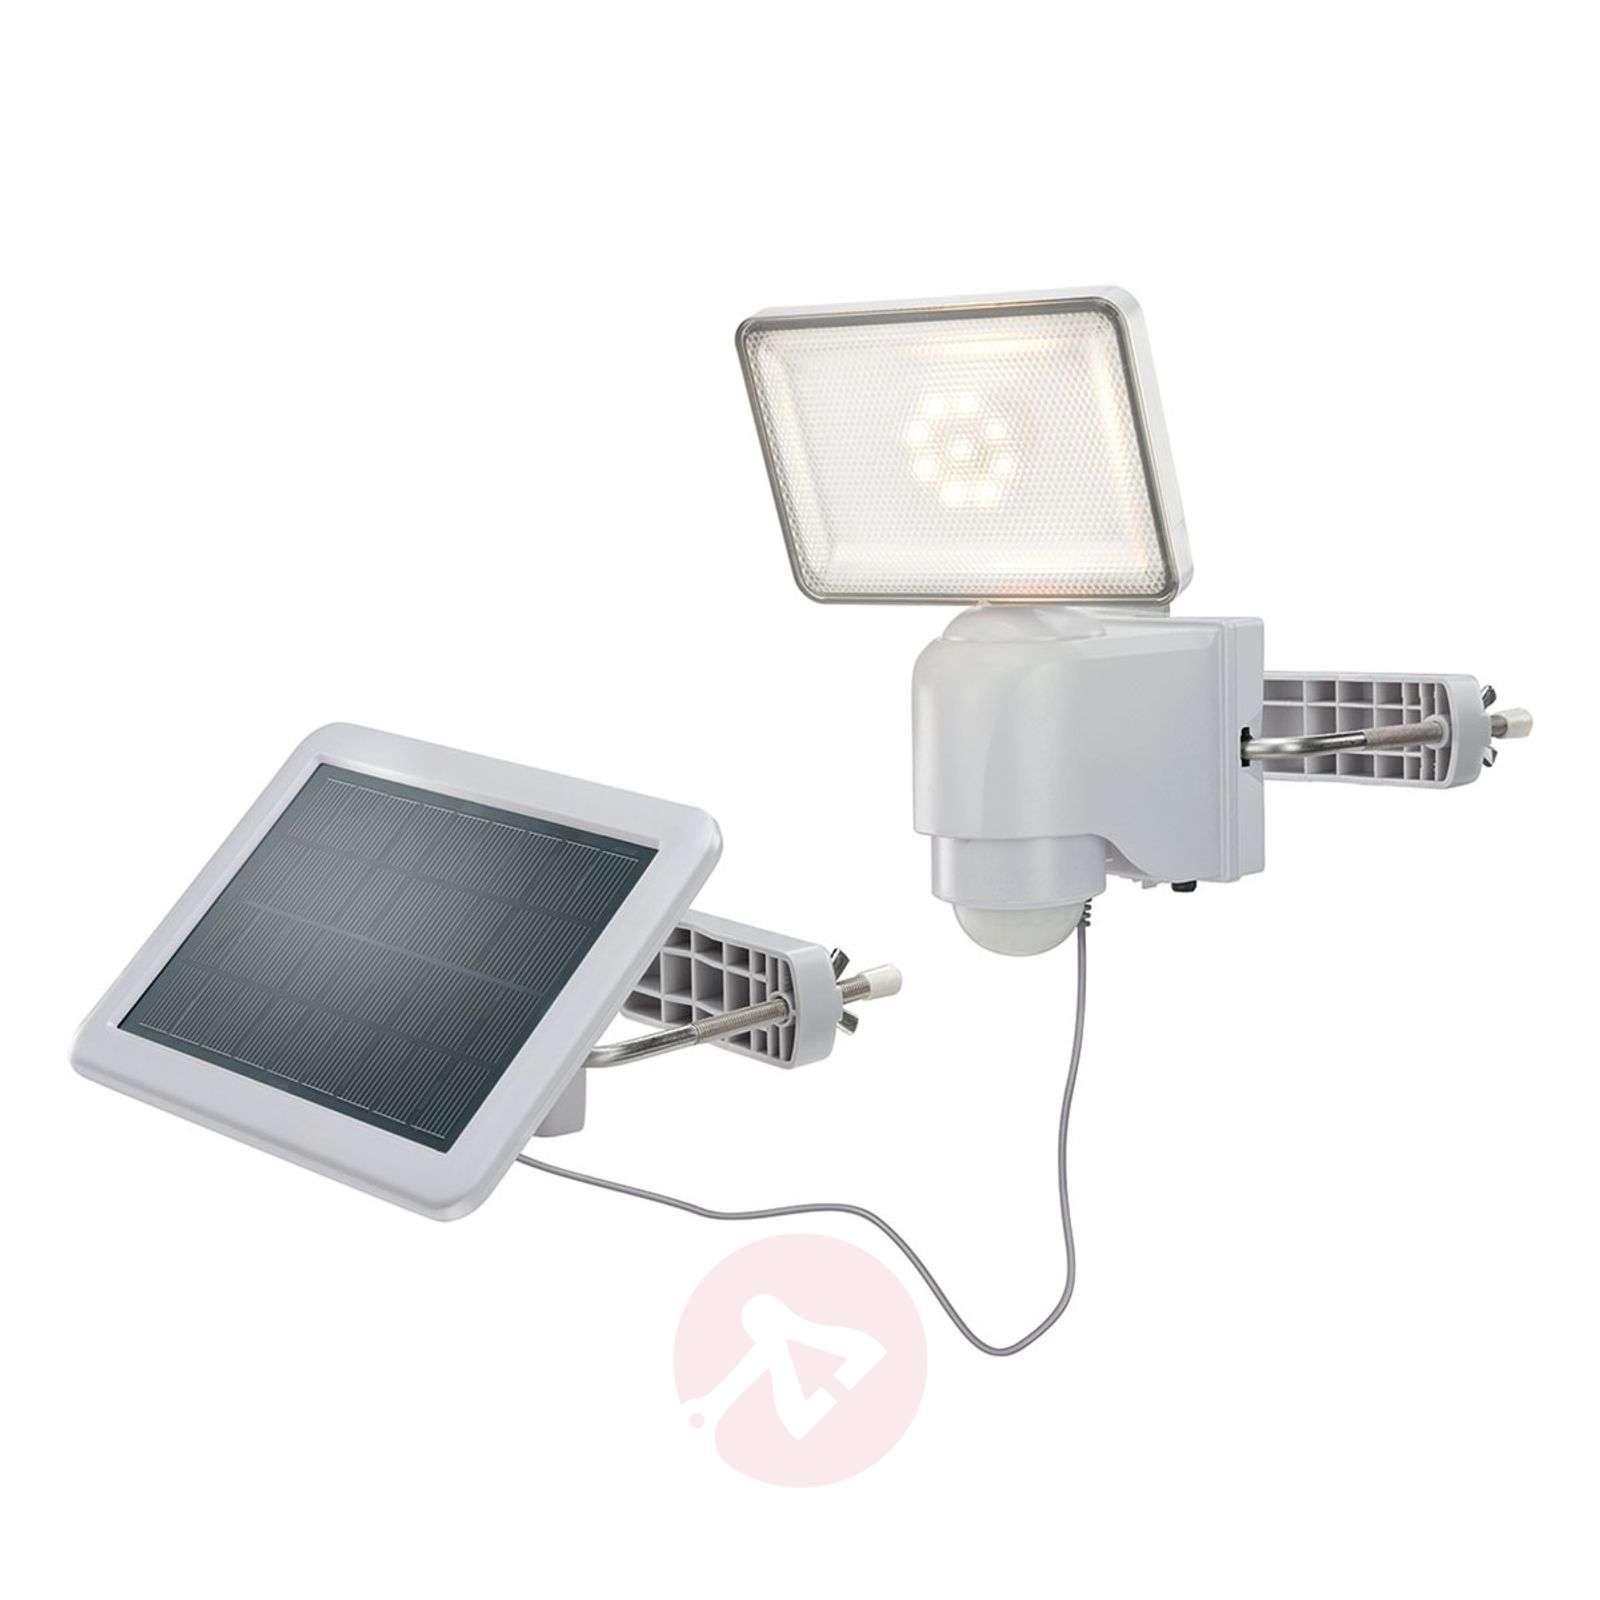 LED solar wall spotlight Power, 500 lm, IR sensor-3012555-01